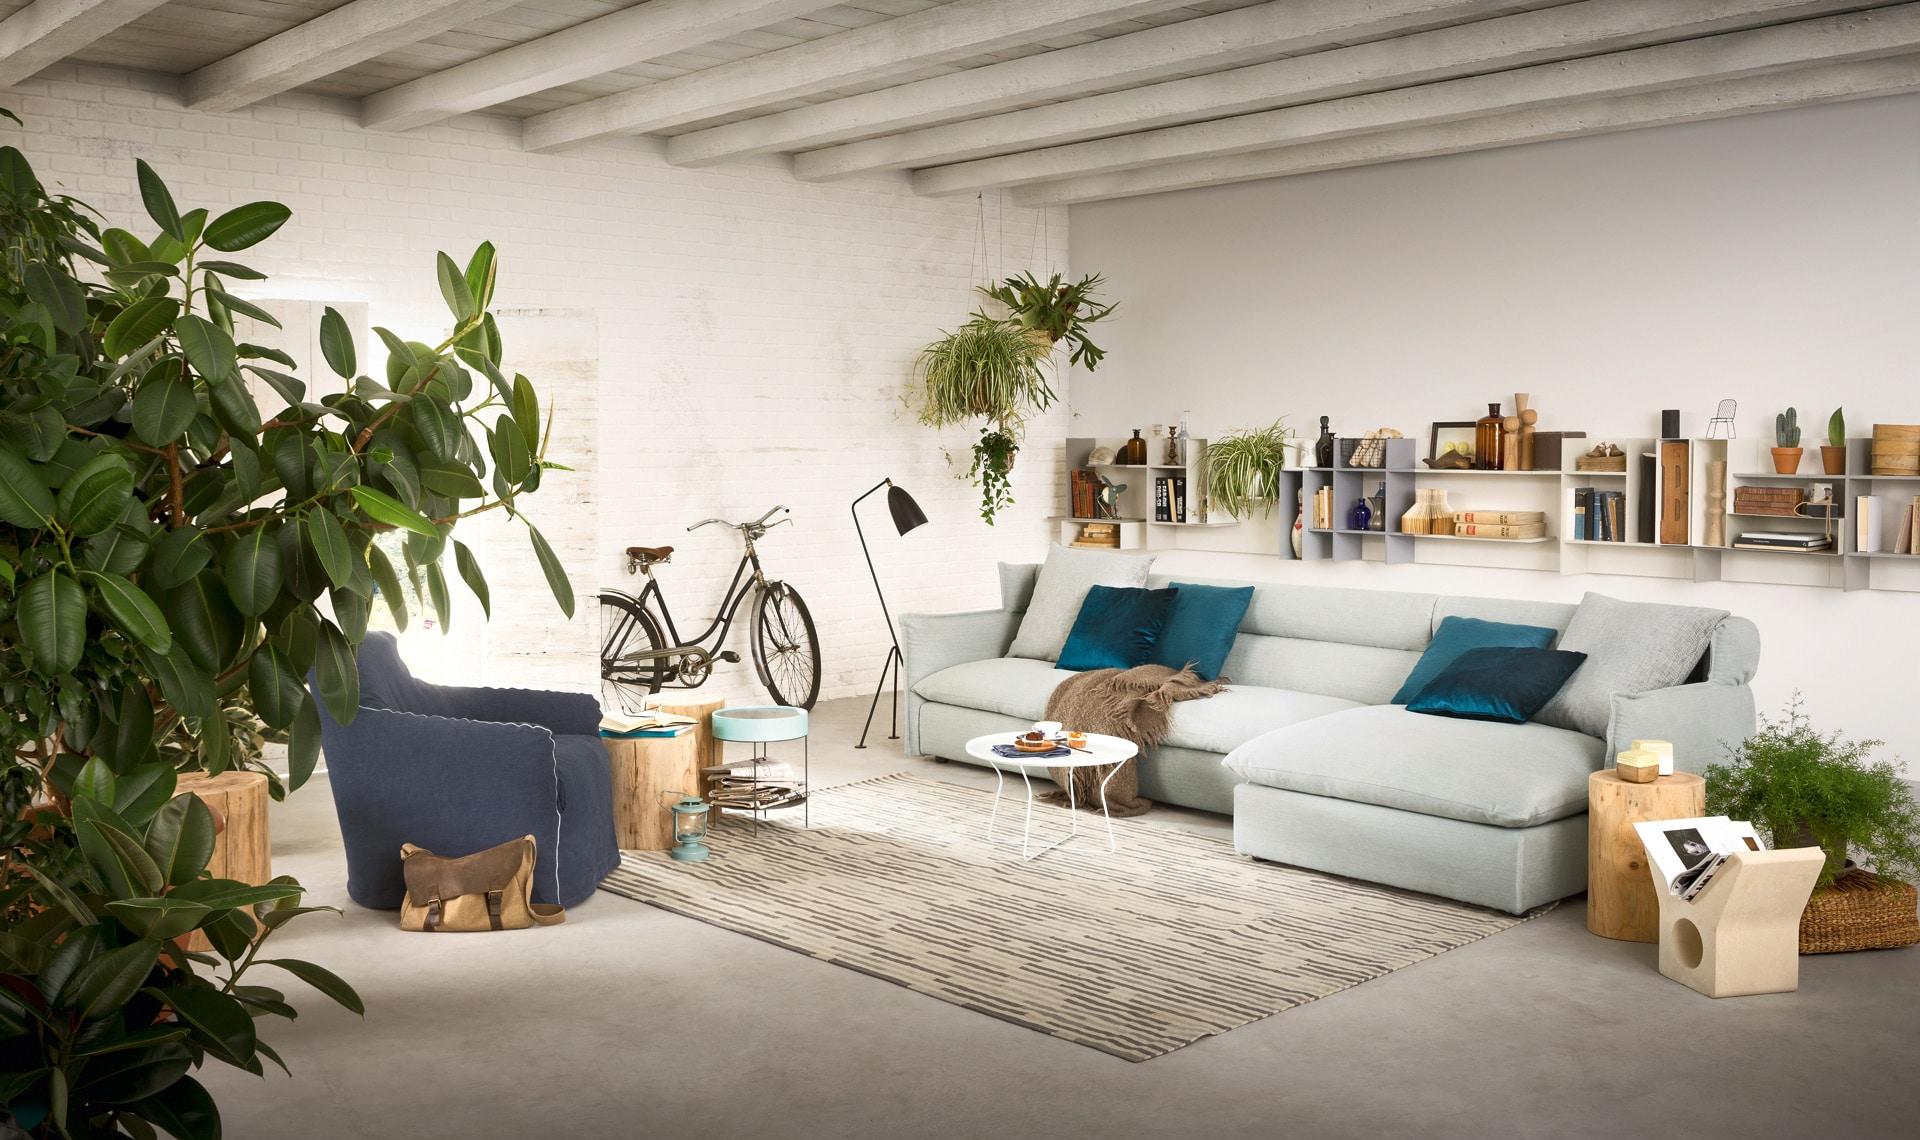 Mueble tapizado clásico marrón claro